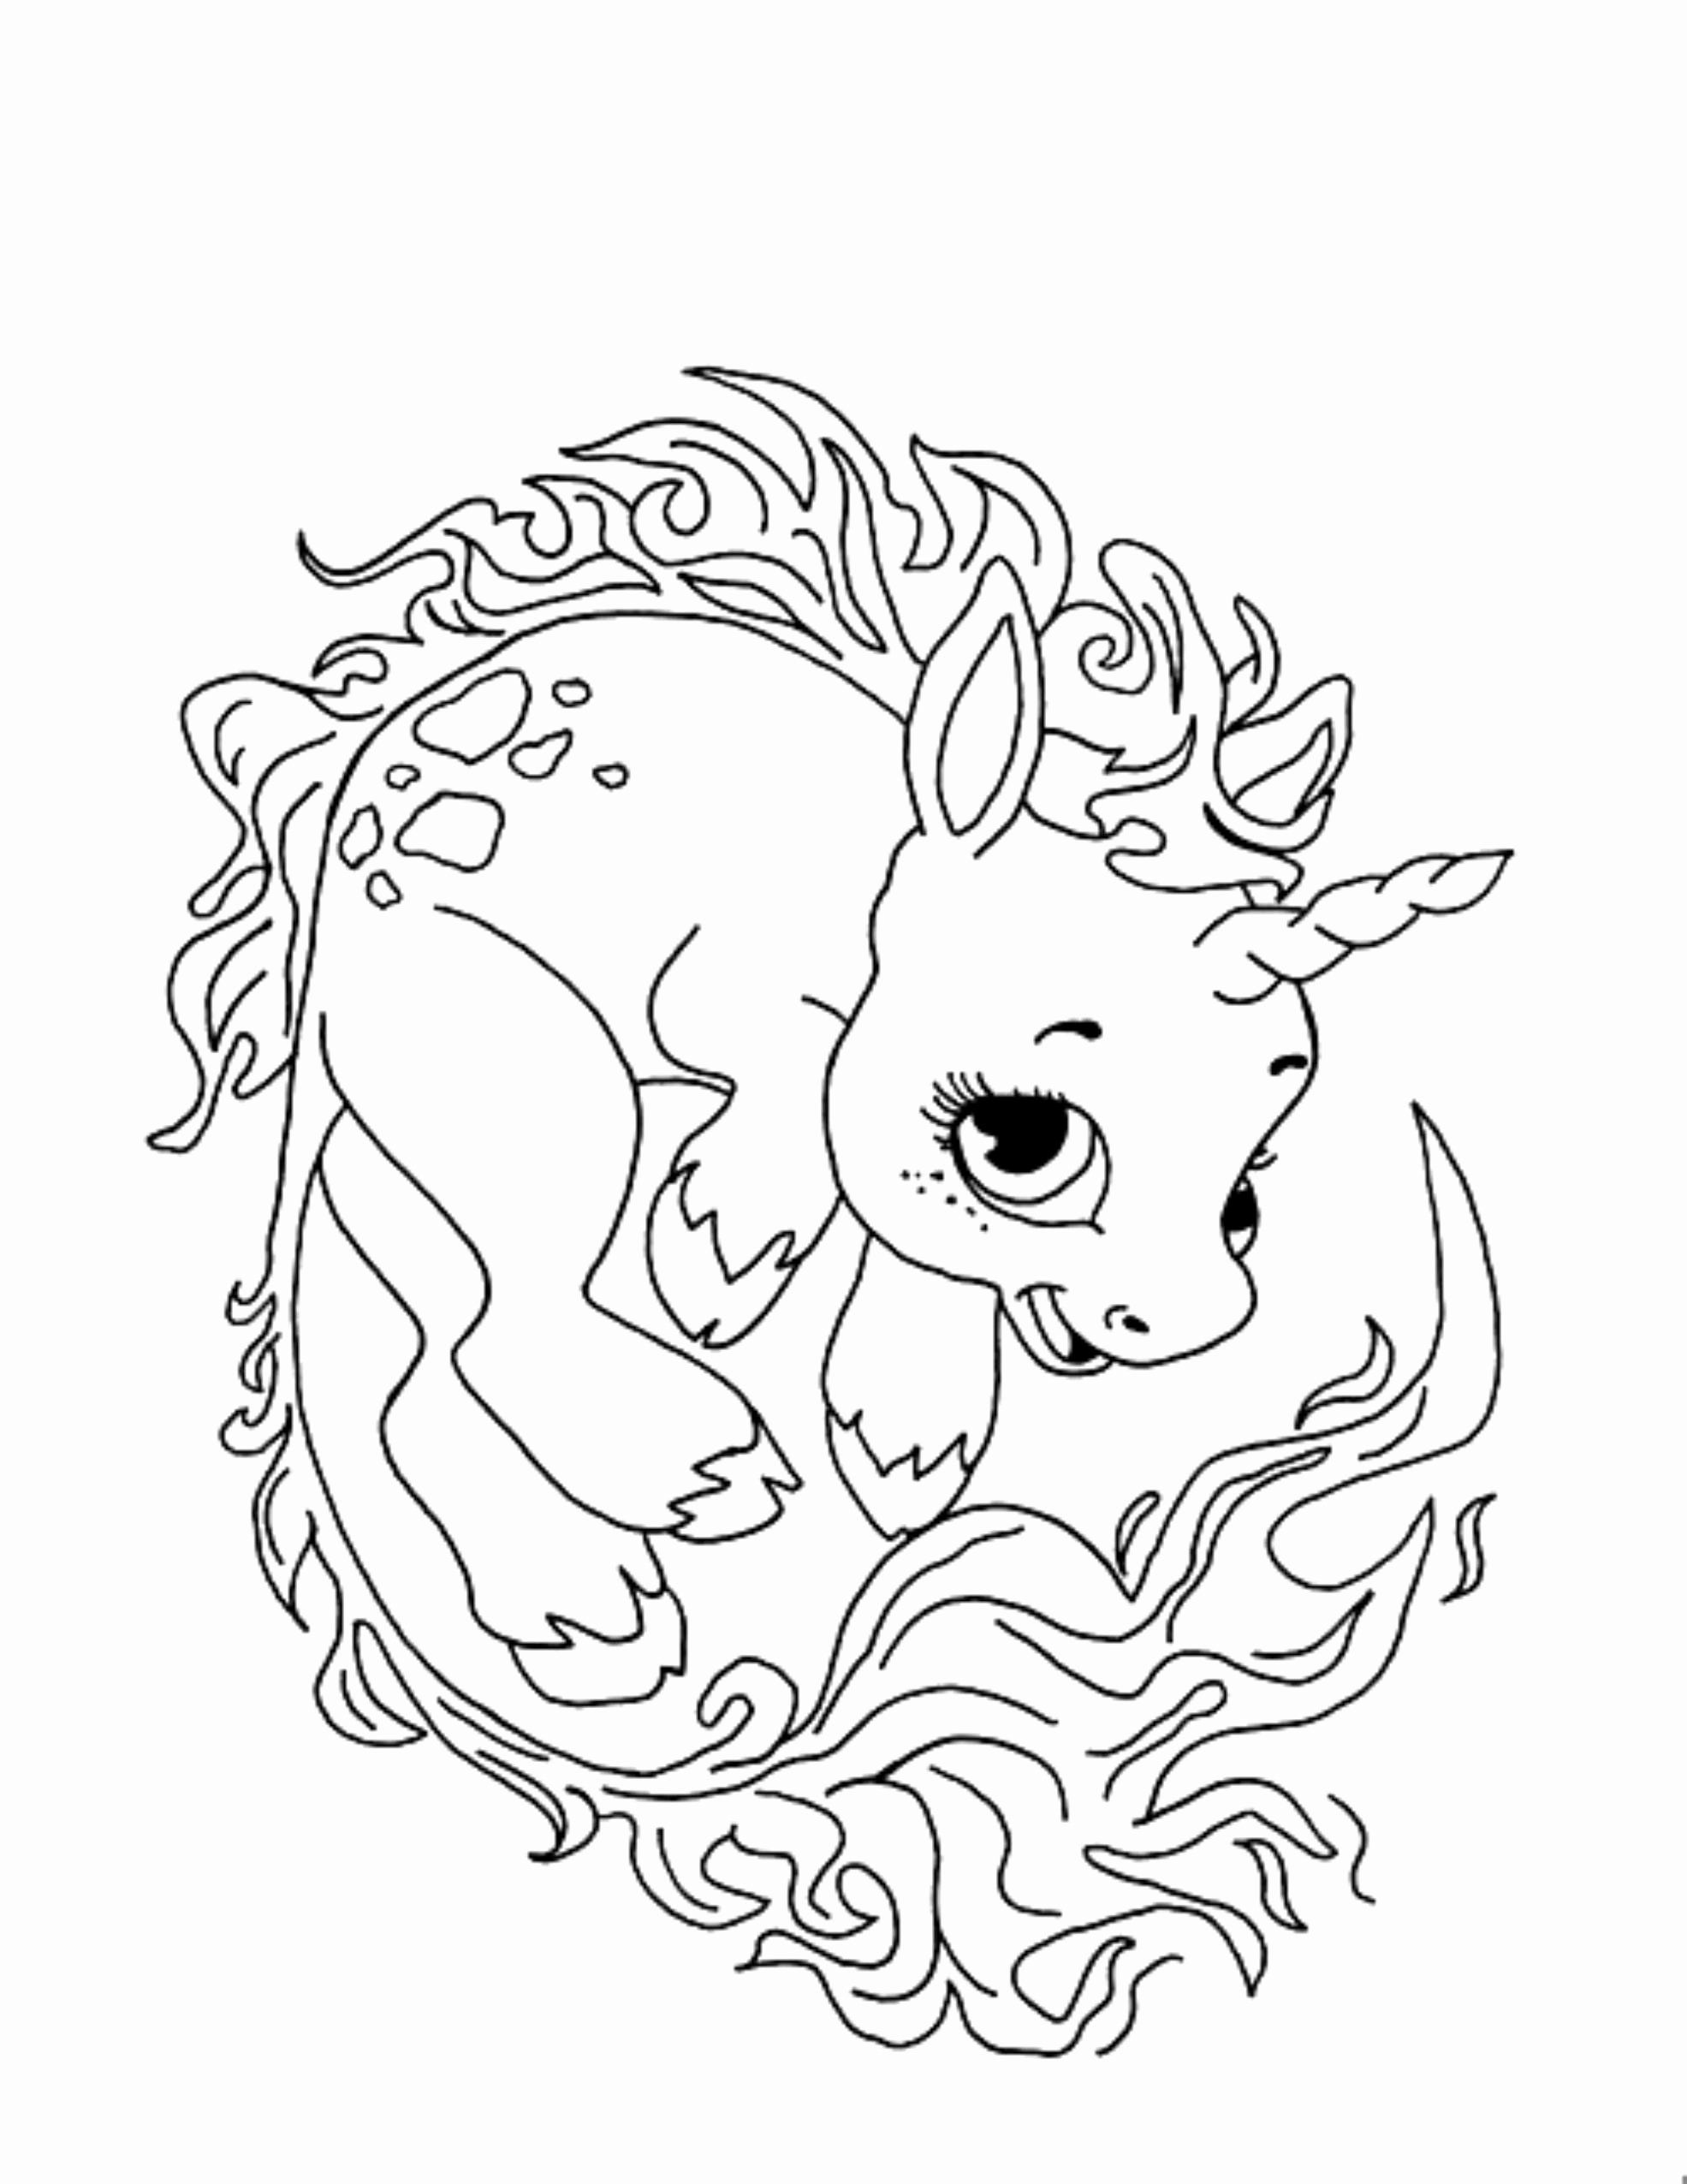 Coloring Sheets Of Unicorns Elegant Cute Unicorn Cake